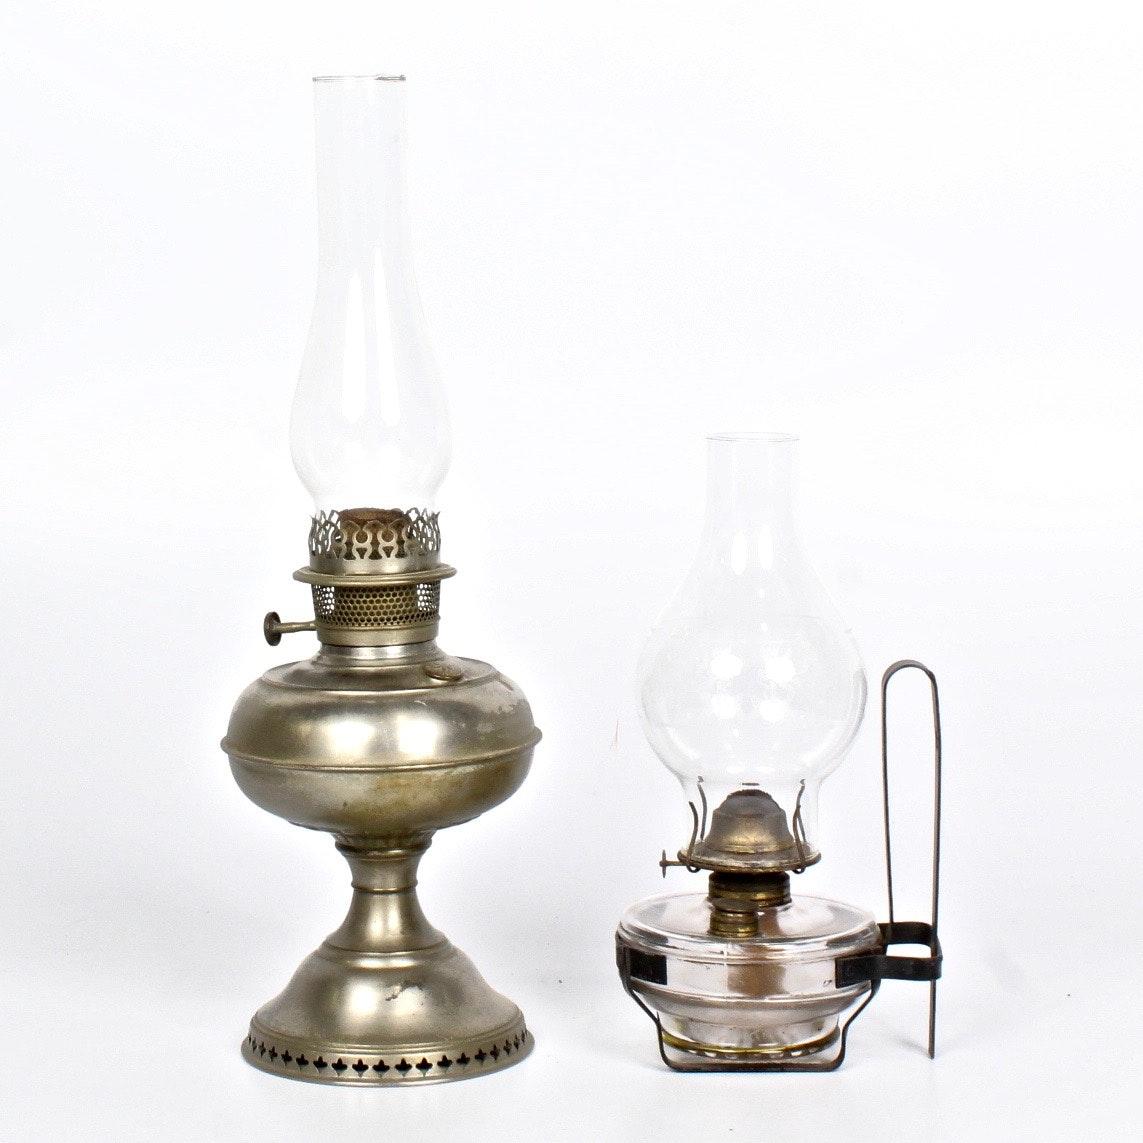 Pair of Kerosene Lamps